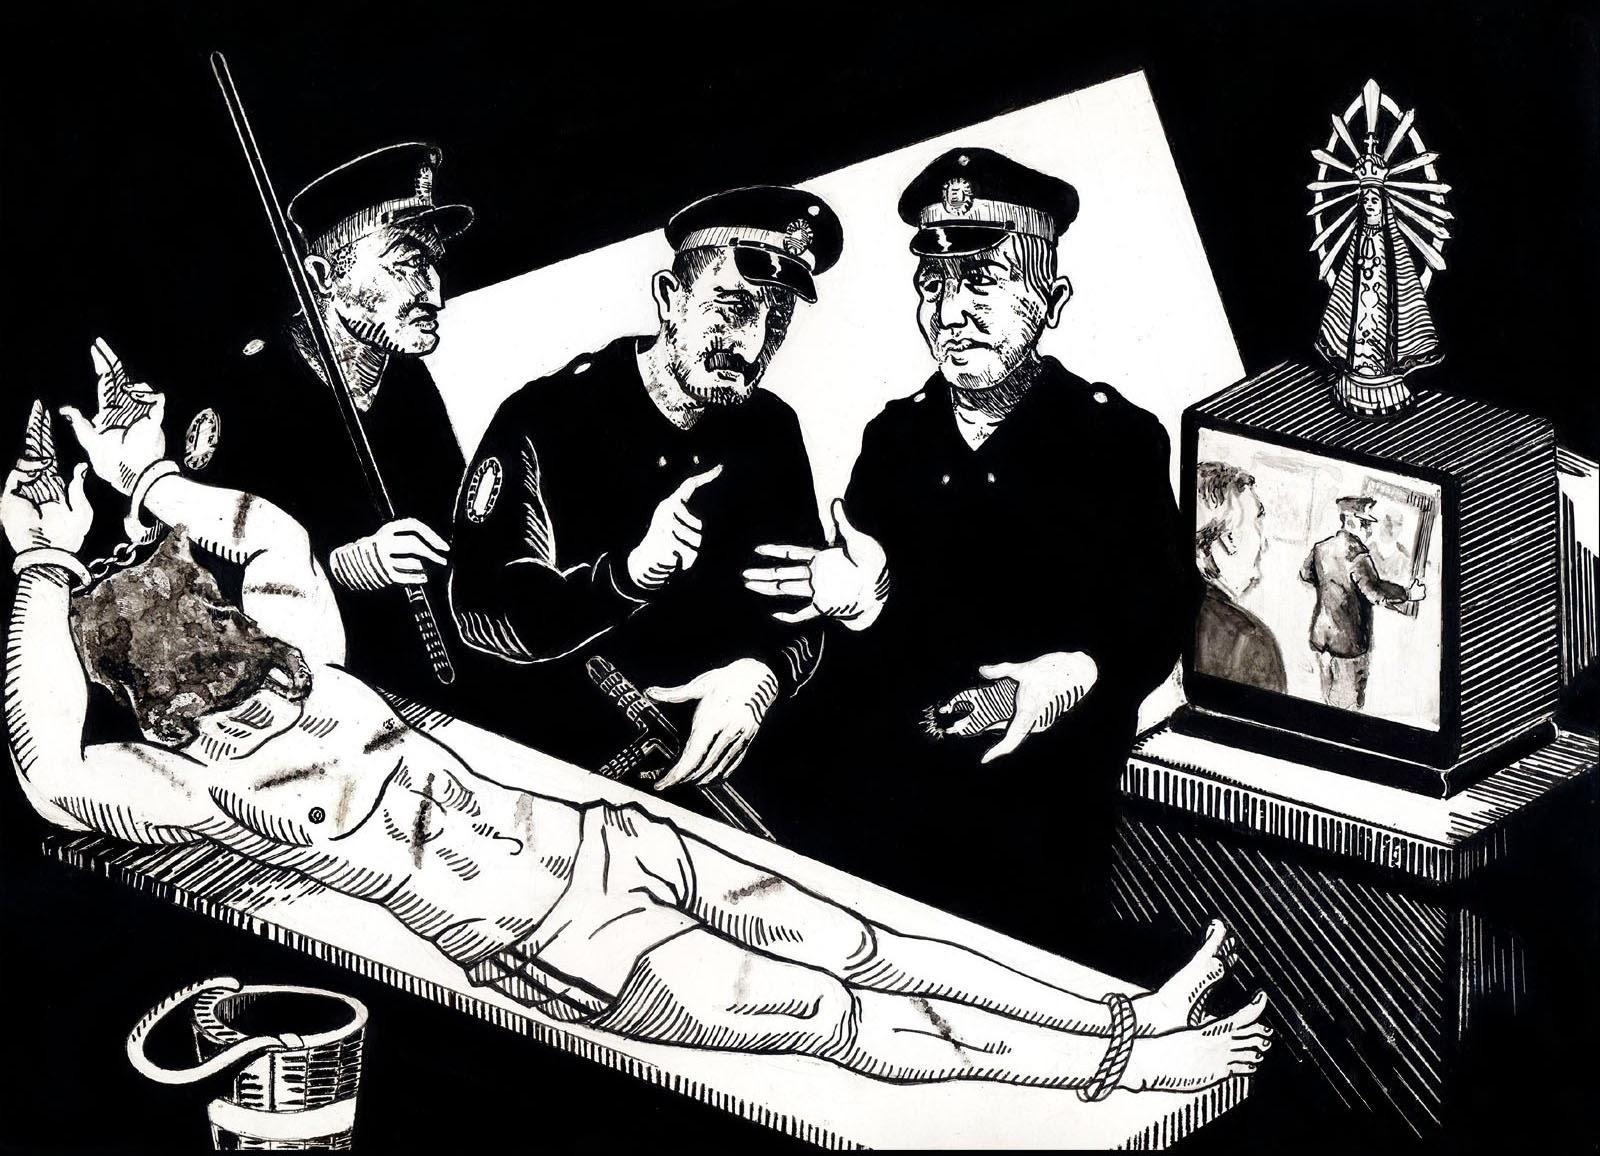 Ilustración/ Narración/ Dibujos/ Palabras: PFA. Praxis Crimminalis ...